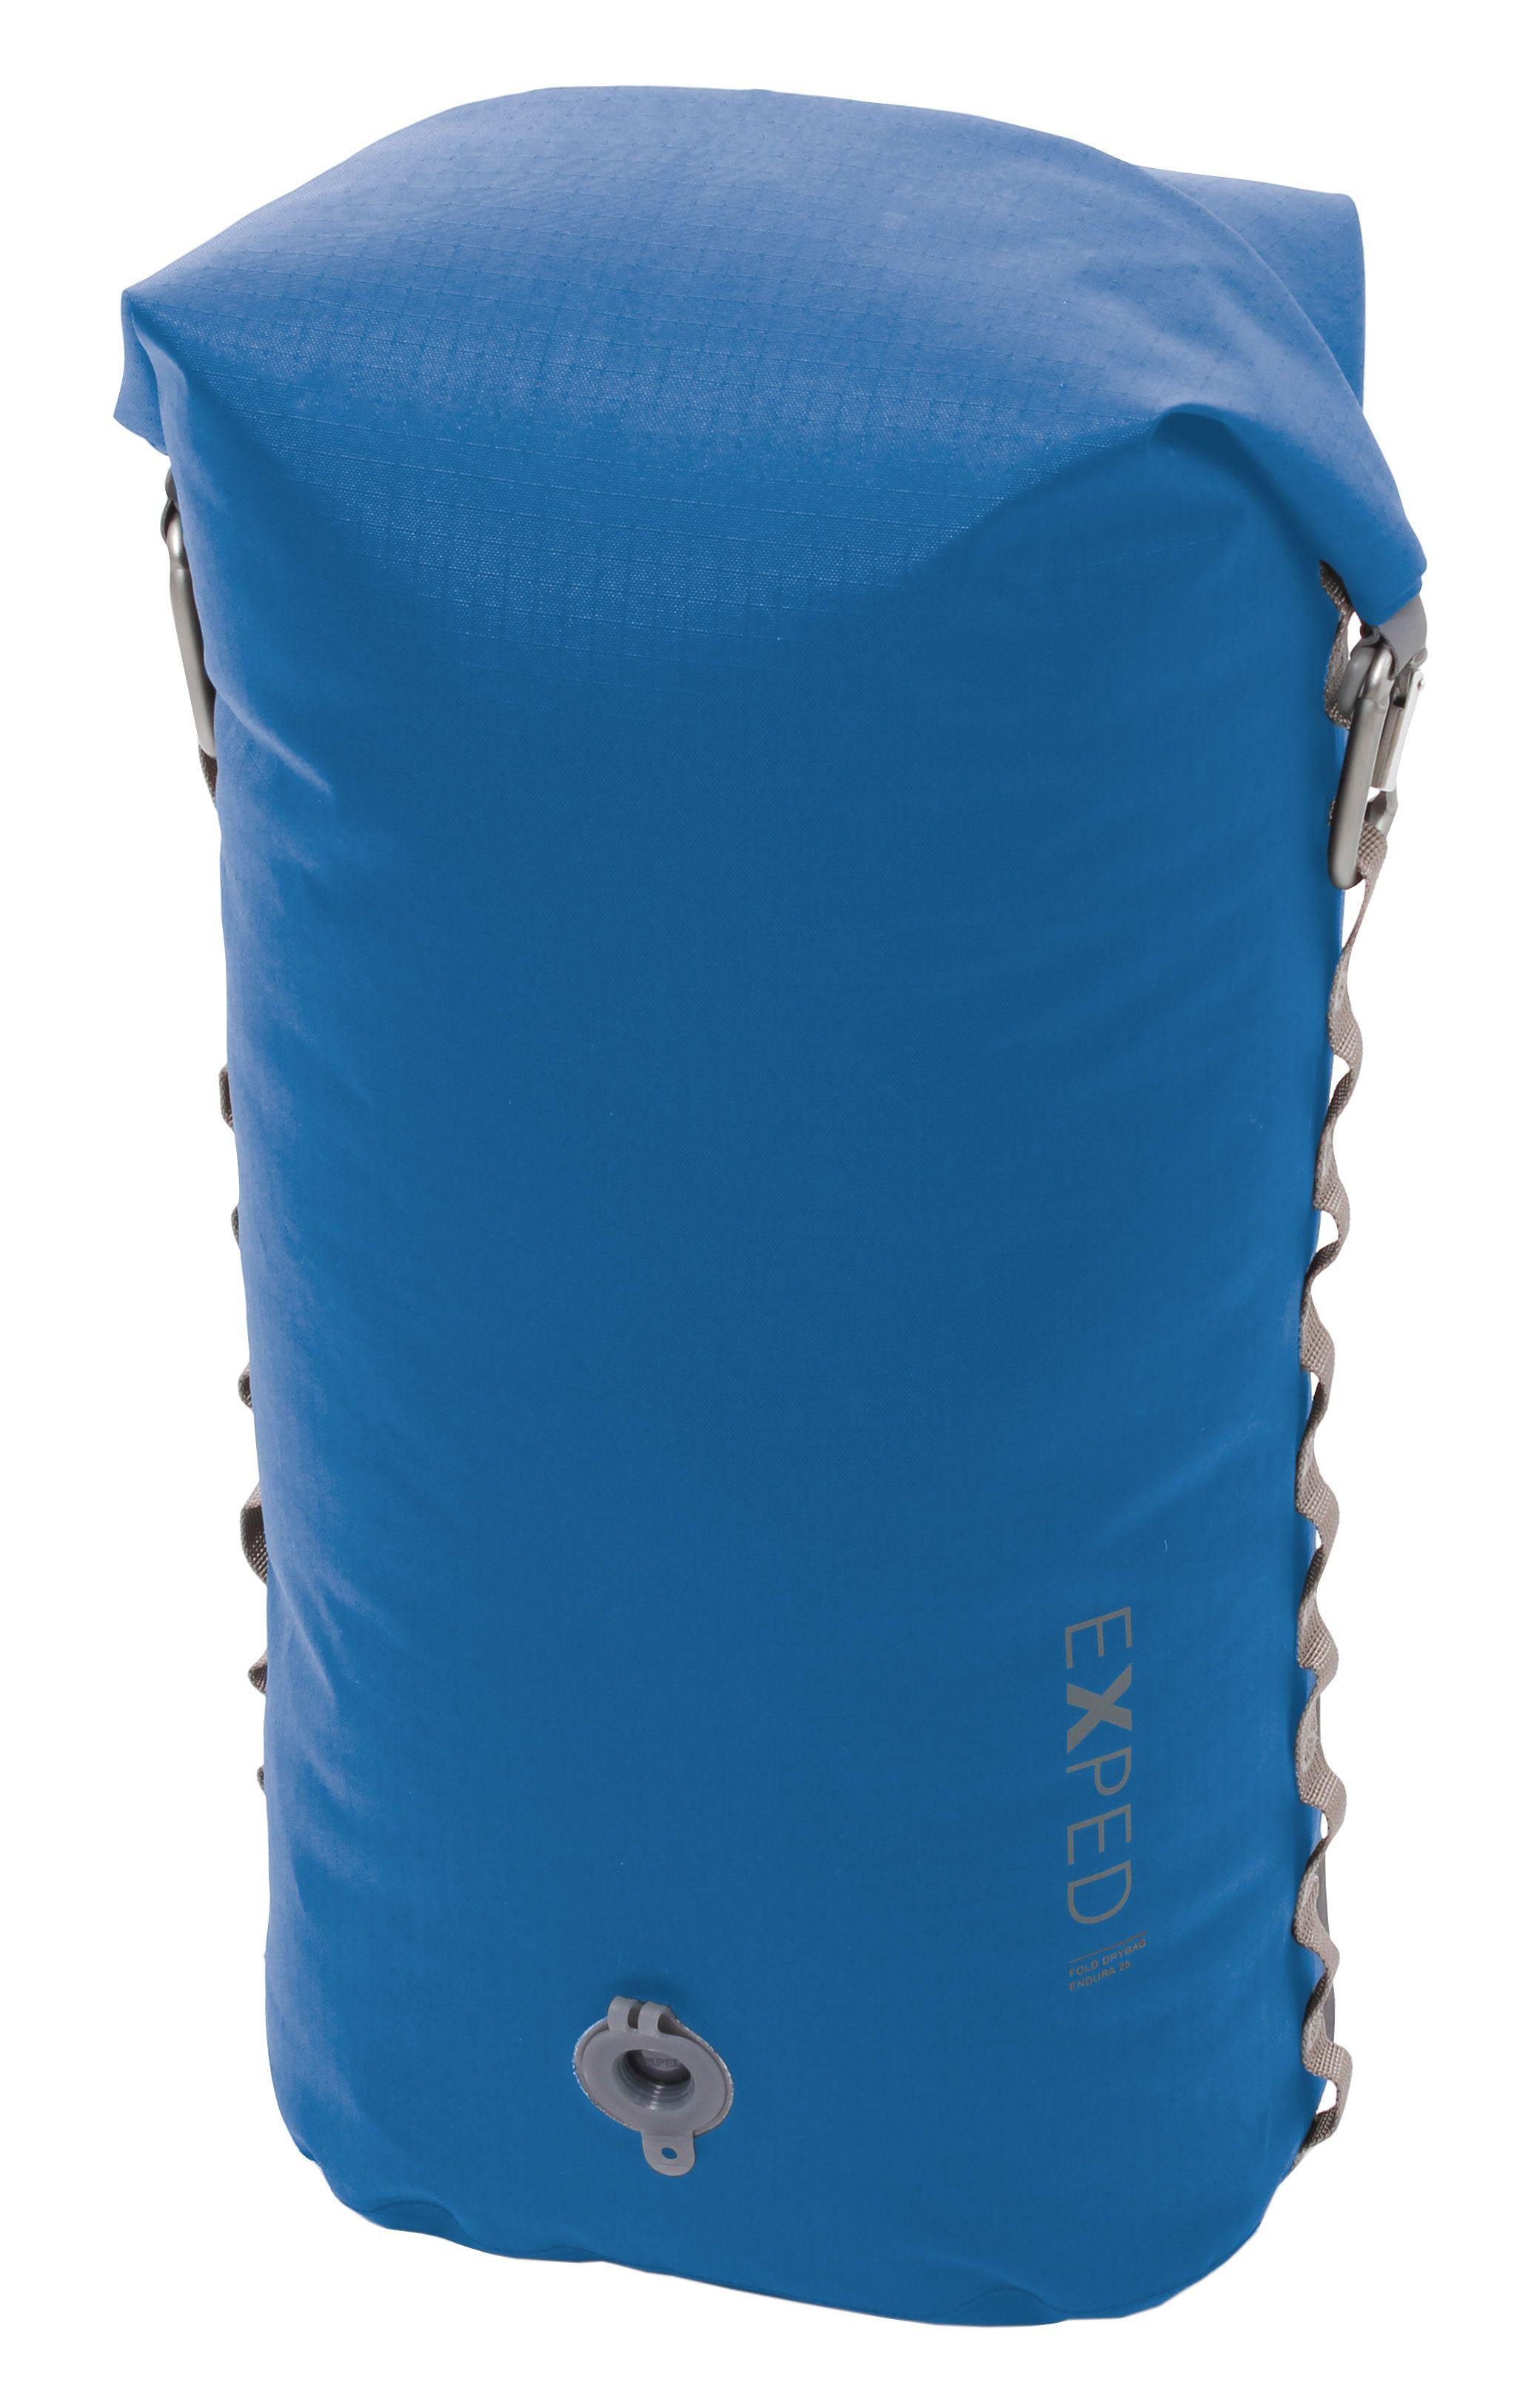 Sac tanche exped fold drybag endura - Sac de compression ...